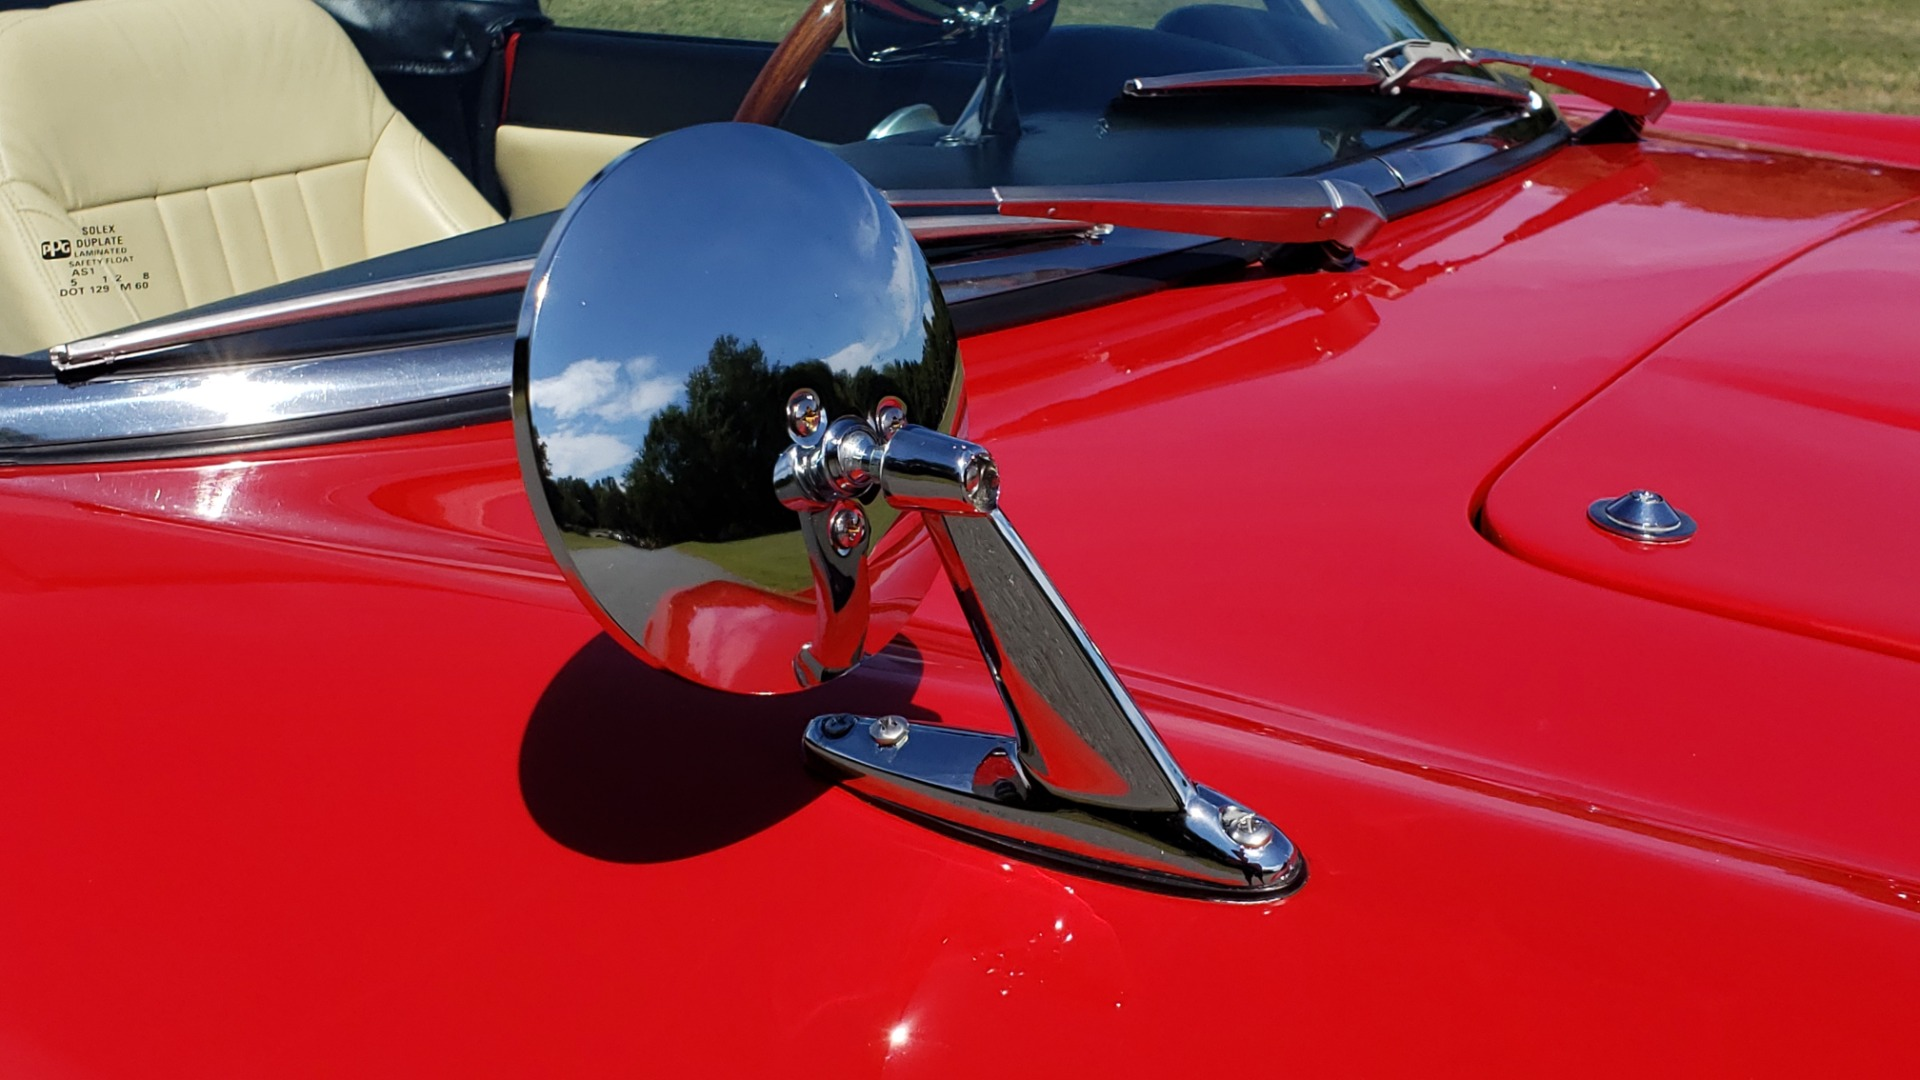 Used 1961 Ferrari 250GT SWB CALIFORNIA REPLICA / 302CI V8 / TREMEC 5-SPEED for sale Sold at Formula Imports in Charlotte NC 28227 32